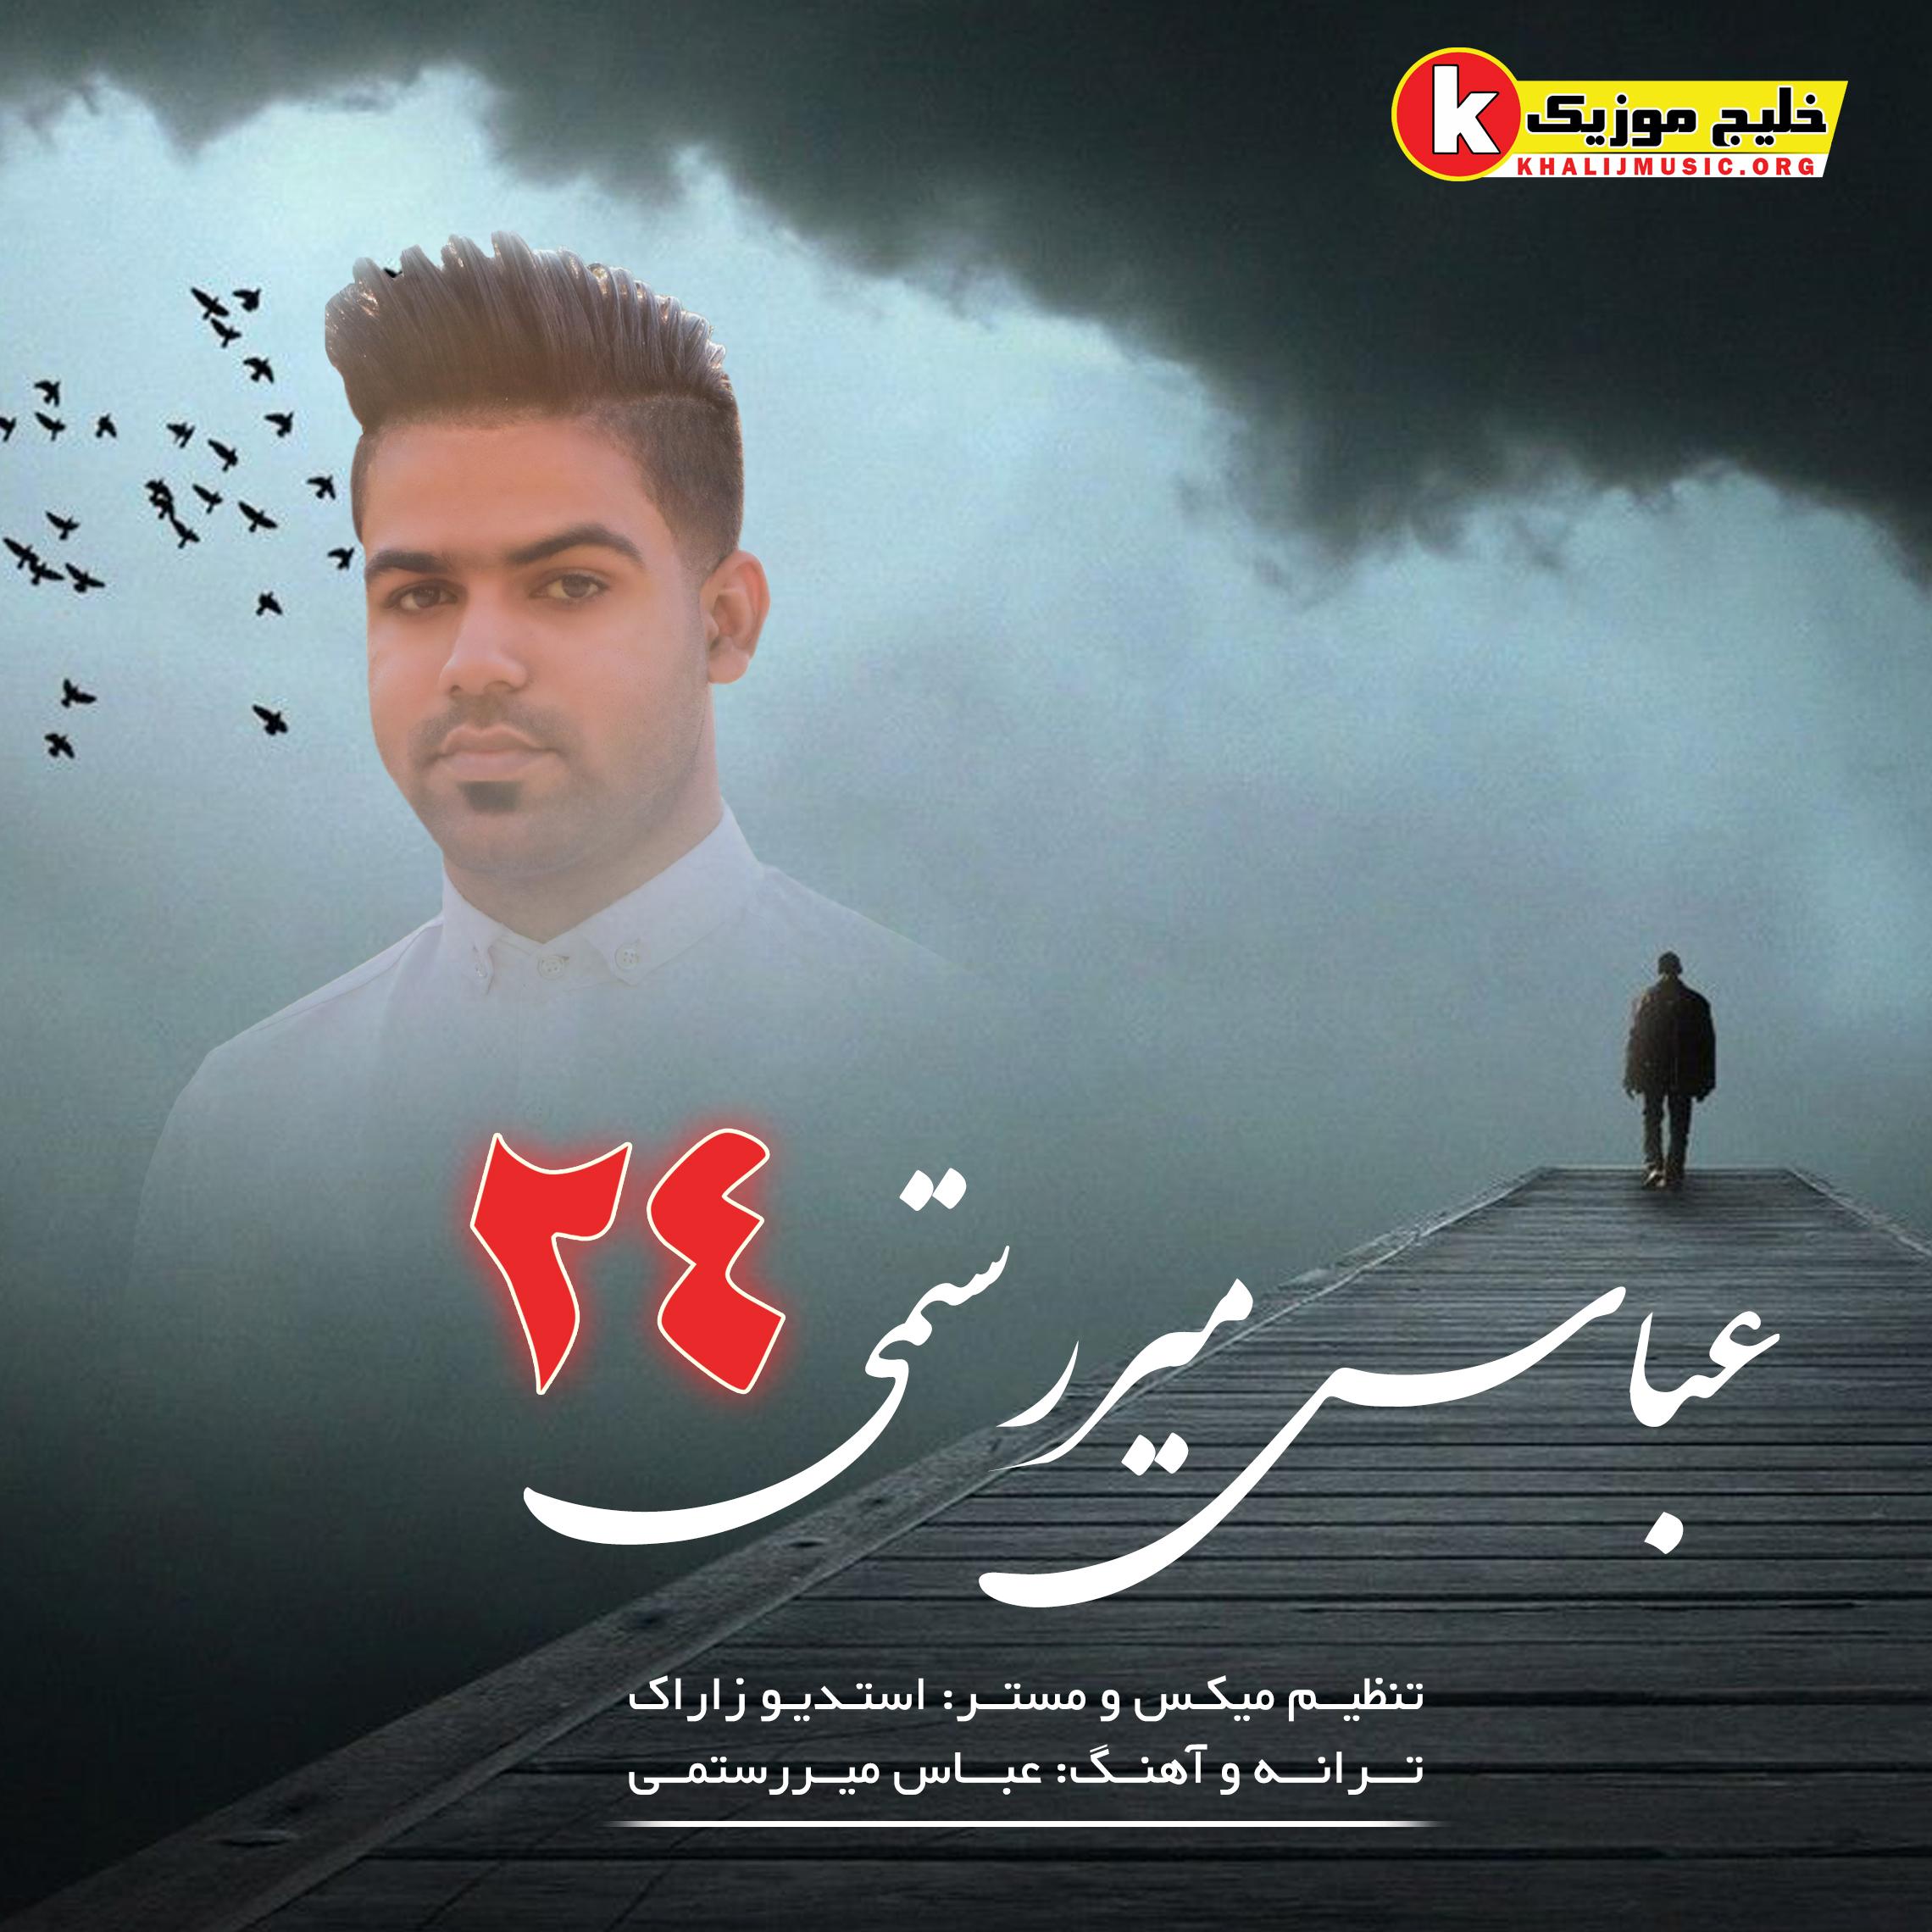 http://dl2.khalijmusic.us/Music-2/abbbsmirrostami-24(1).jpg